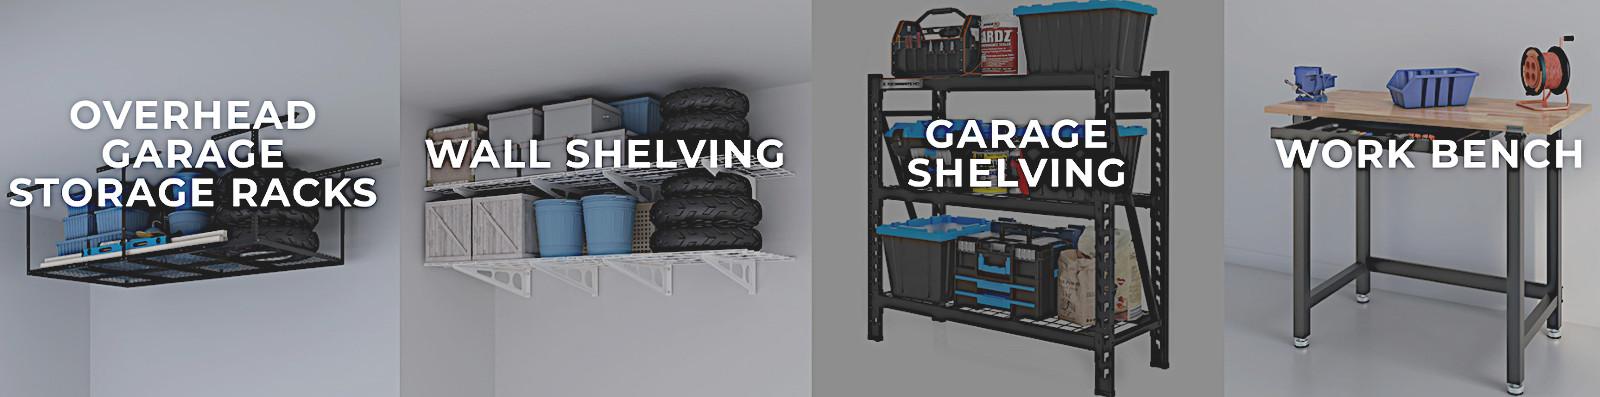 Low-priced garage storage racks